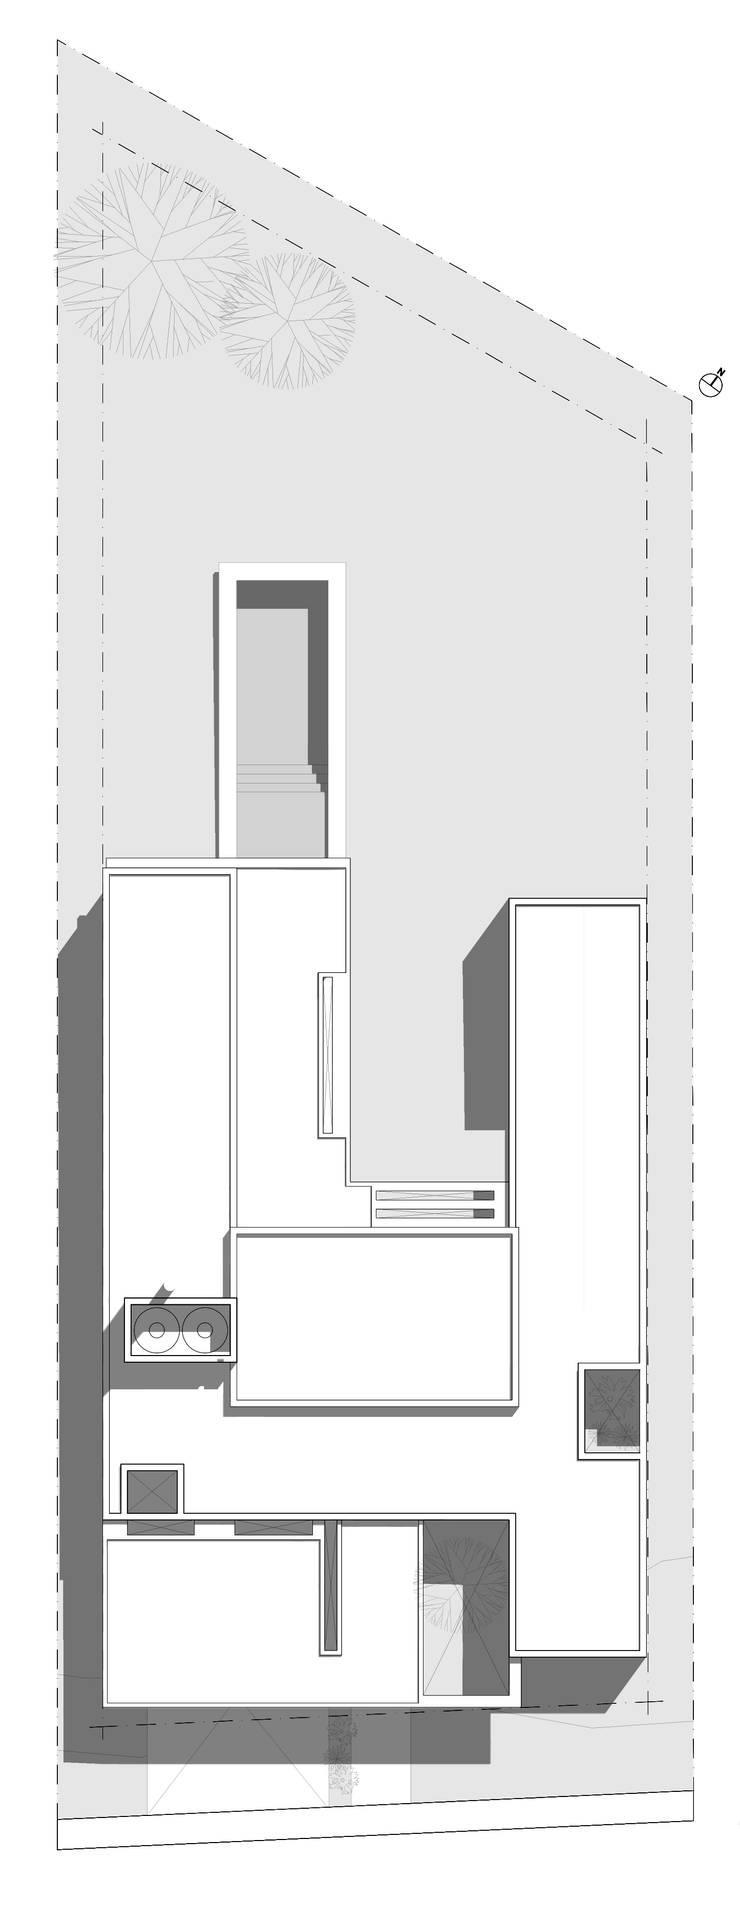 CASA QP:  de estilo  por Poggi Schmit Arquitectura